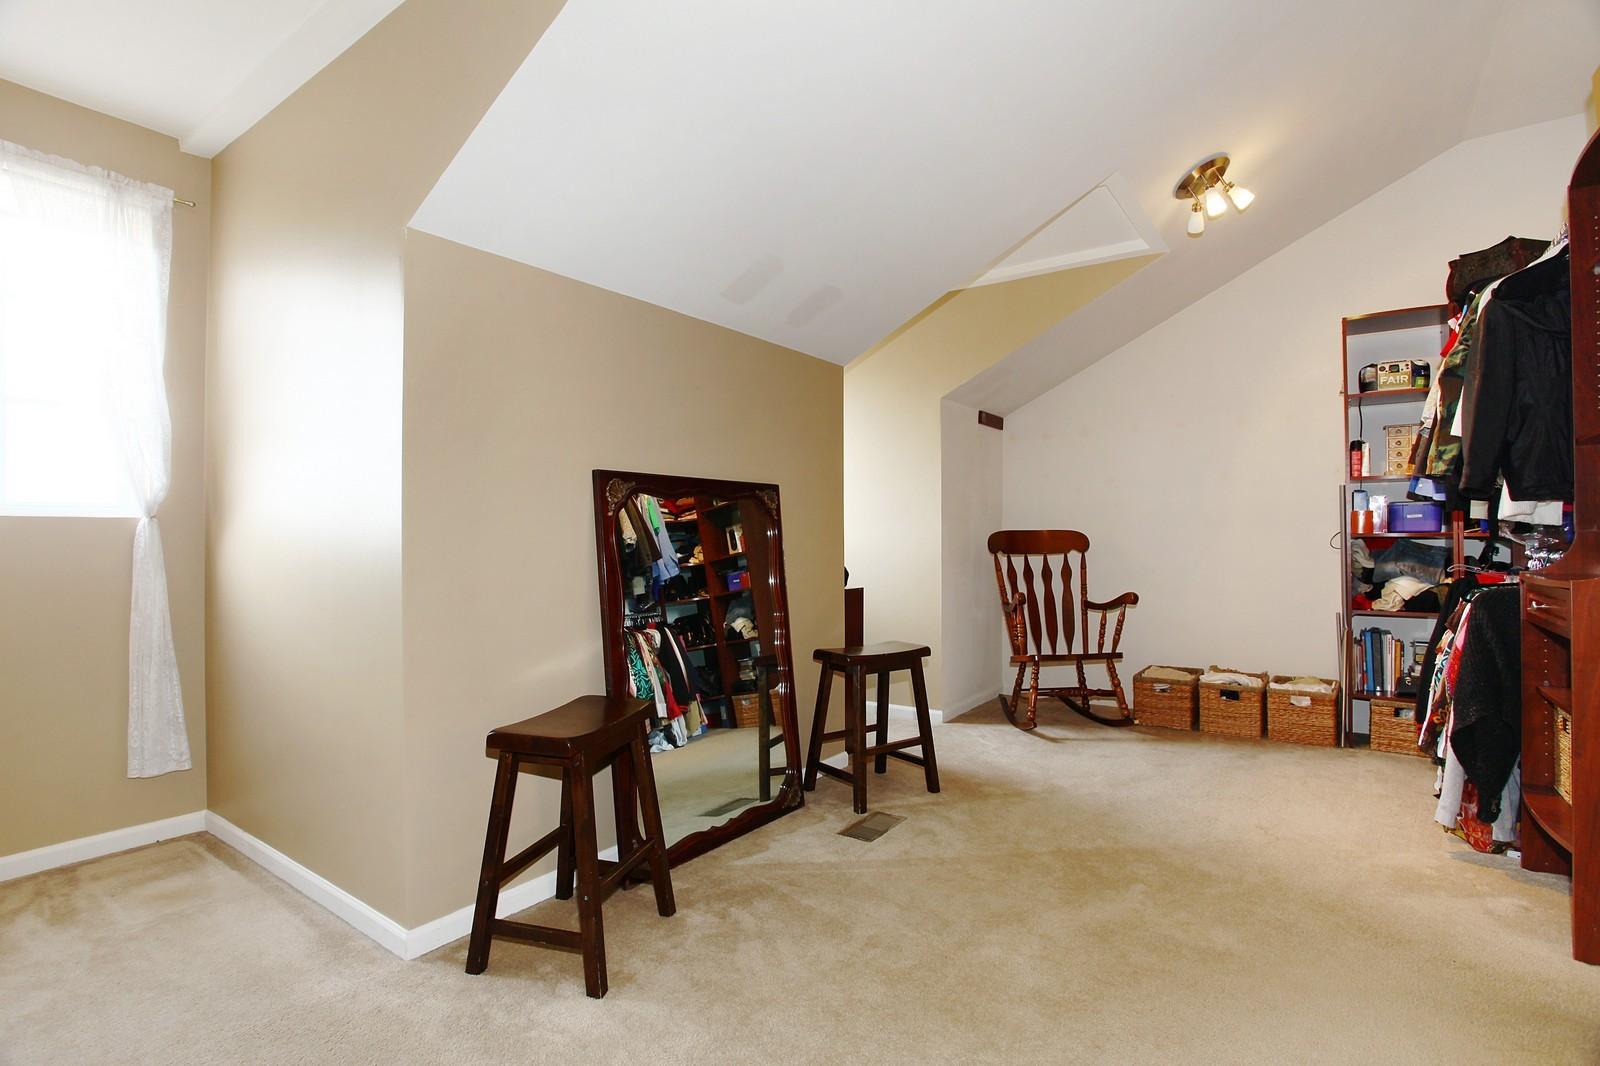 Real Estate Photography - 3298 Fieldstone Dr, Geneva, IL, 60134 - Master Bedroom Closet